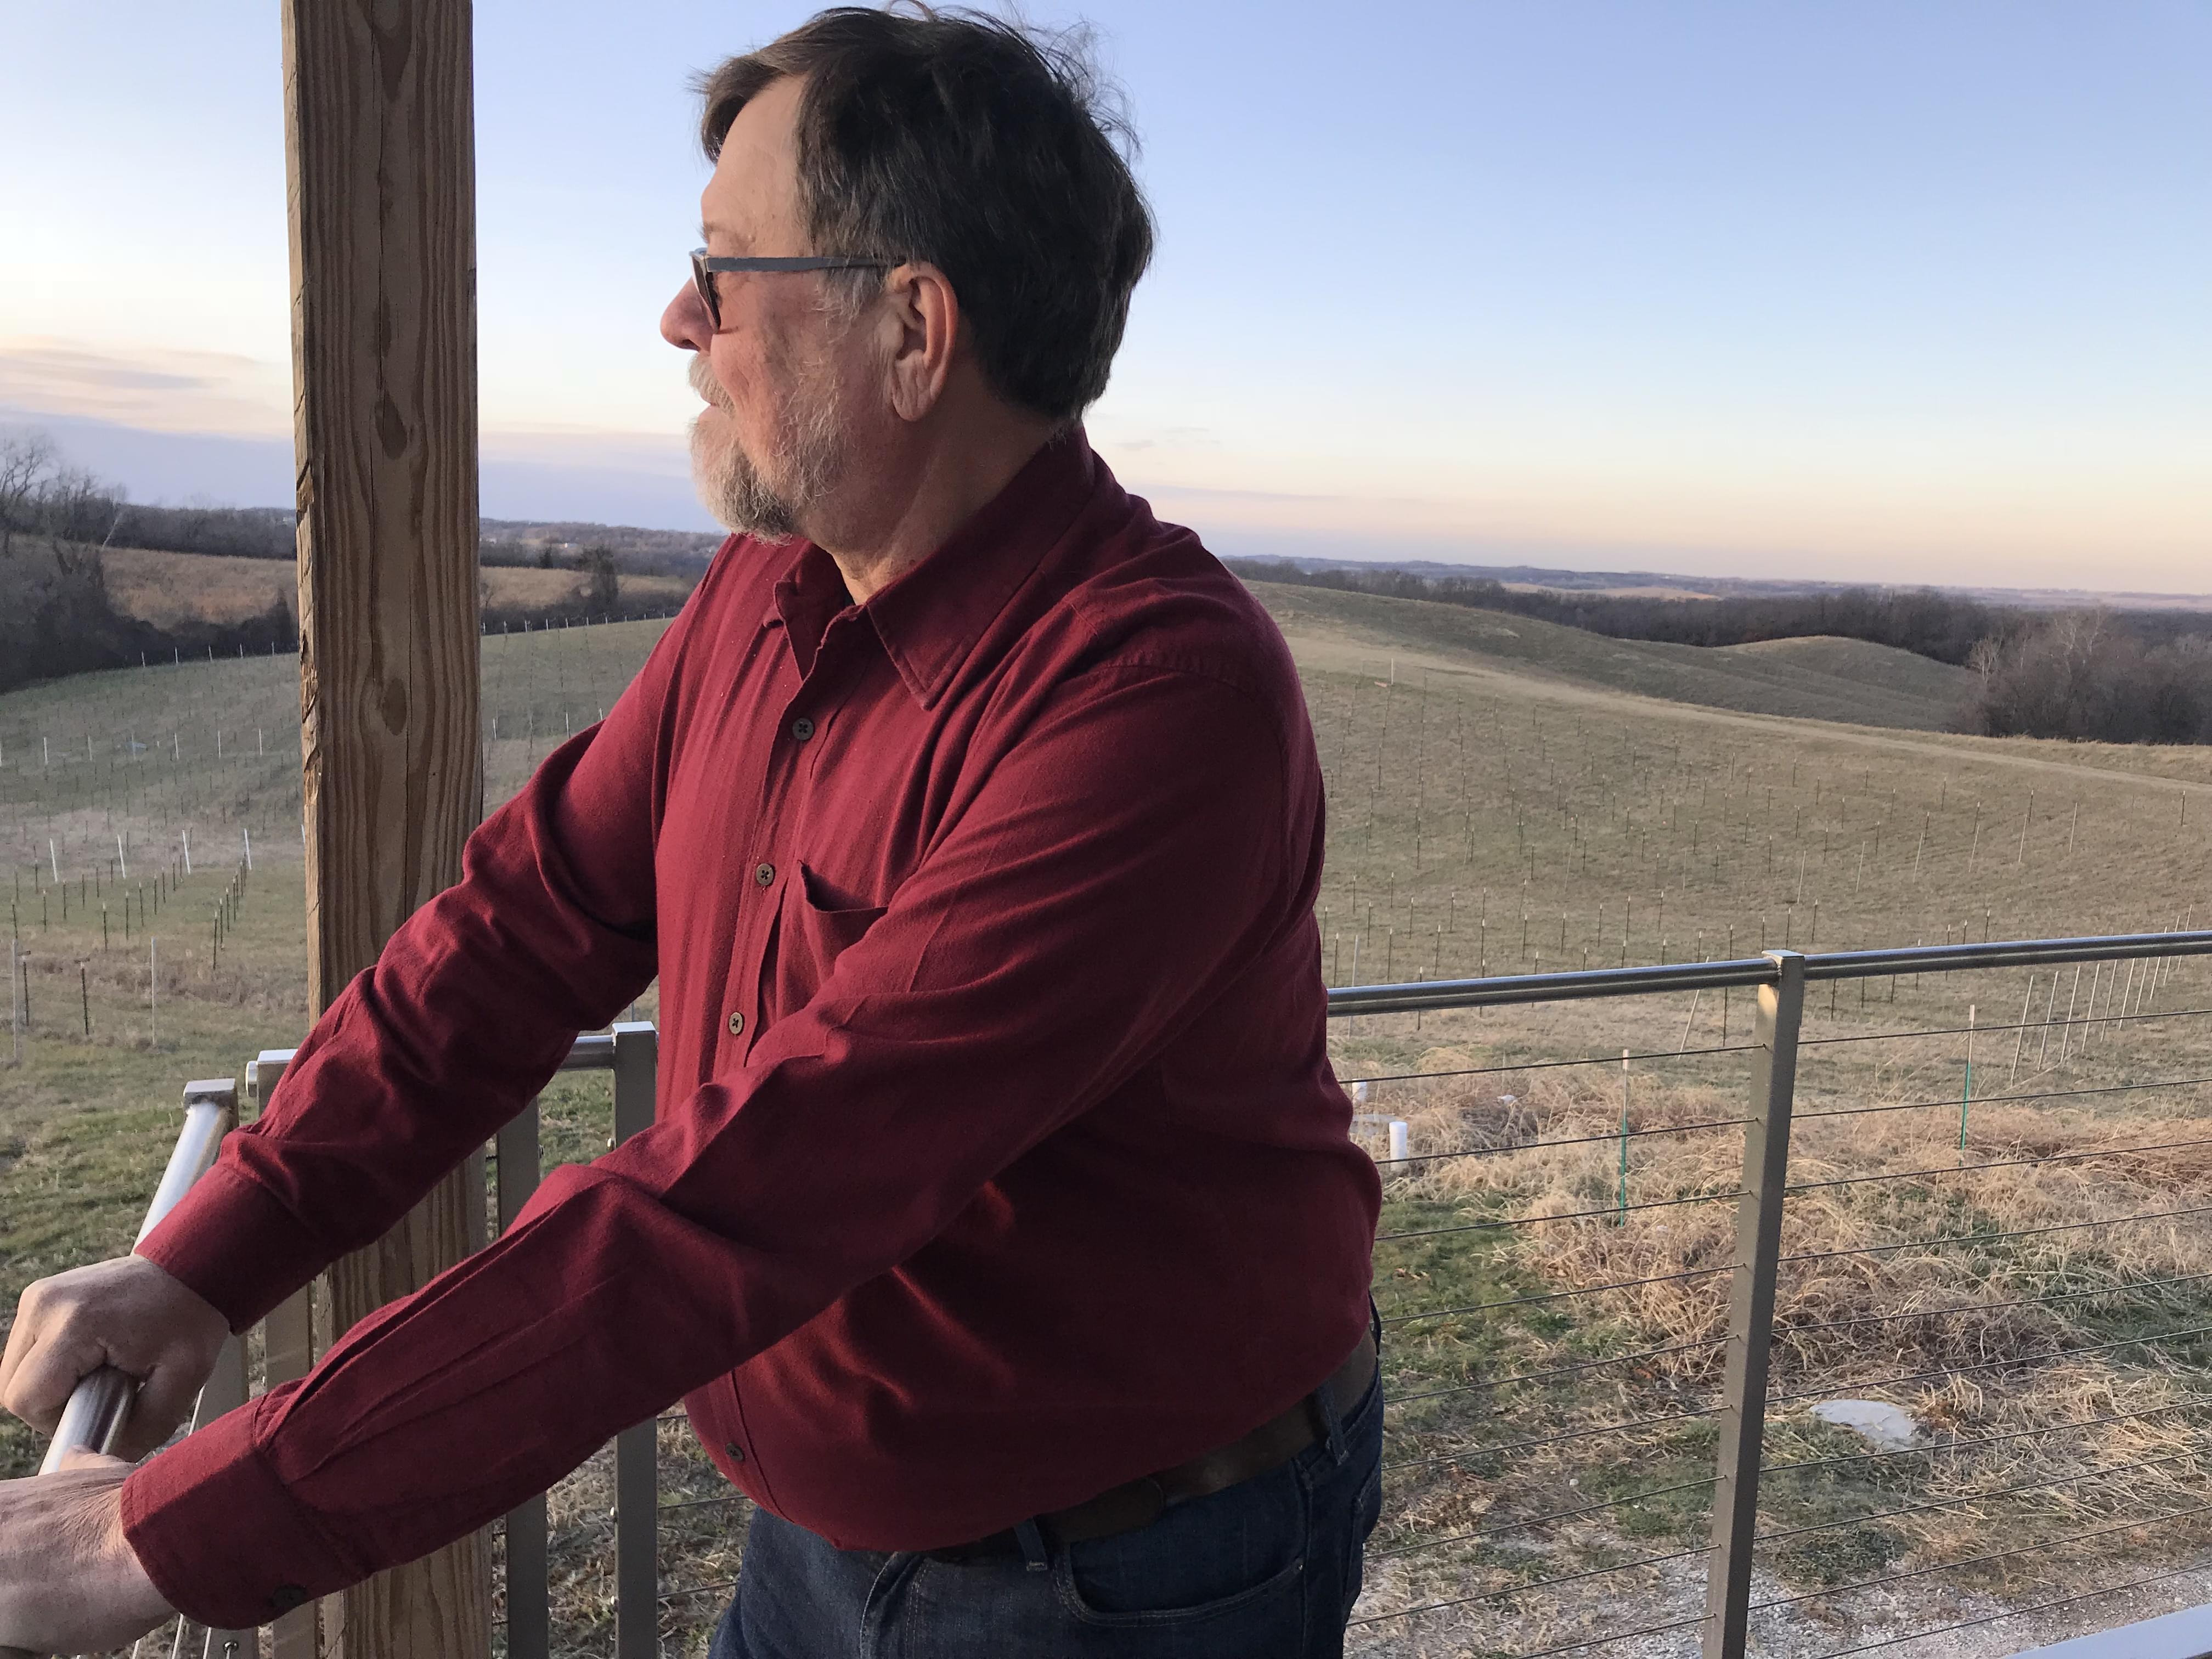 Jerry Eisterhold runs Vox Vineyards in Weston, Missouri. Here's working to save long-lost American wine grape varietals.